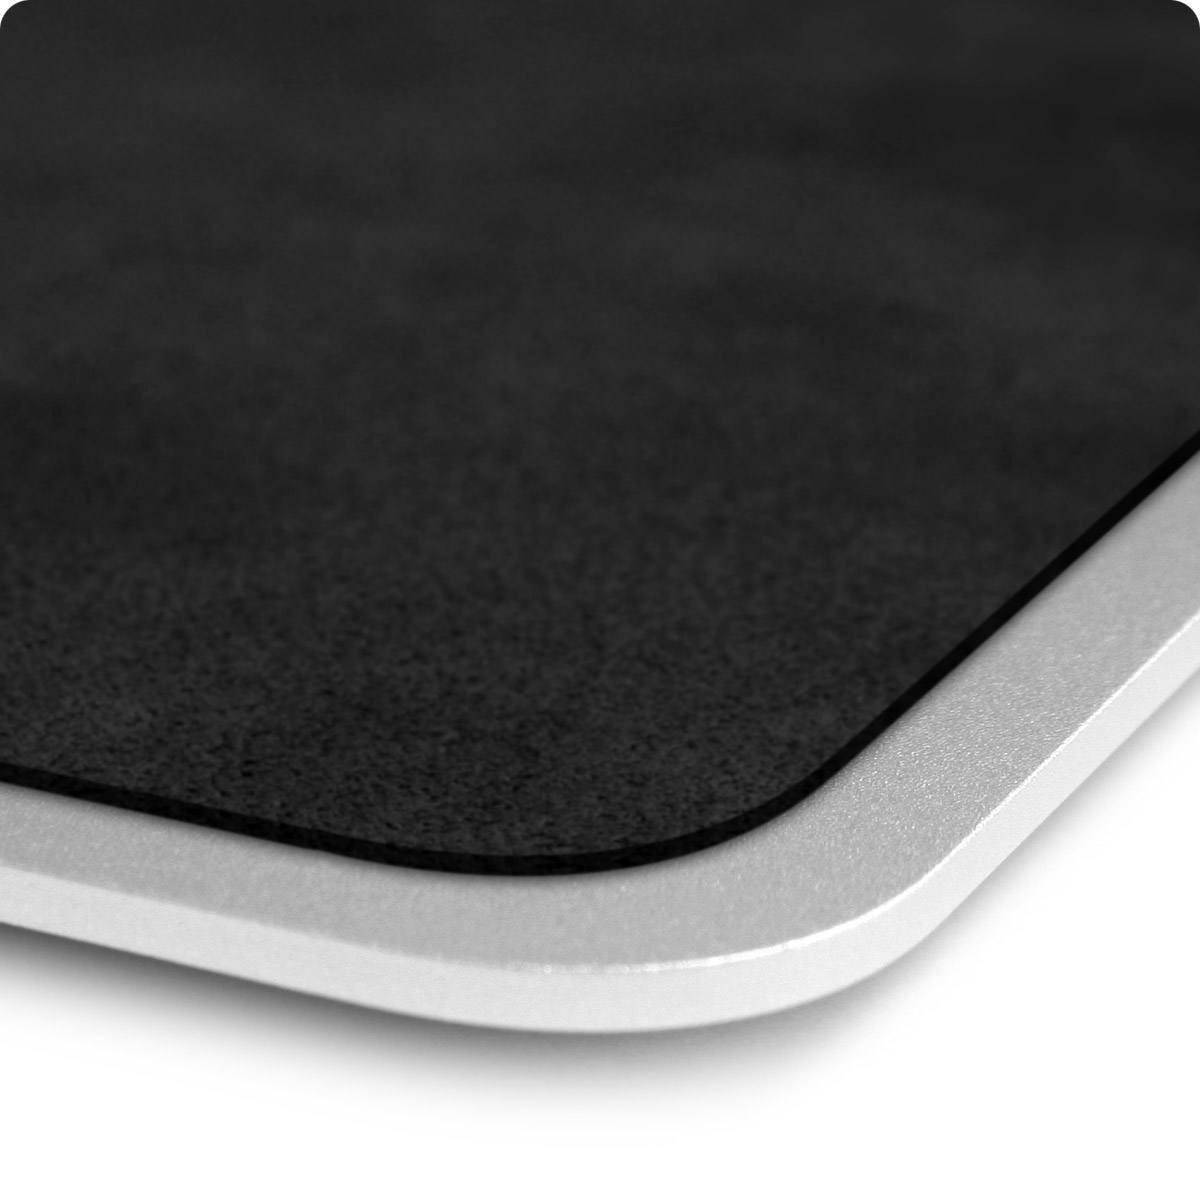 ScreenSavrz, Apple MacBook 12 - Black